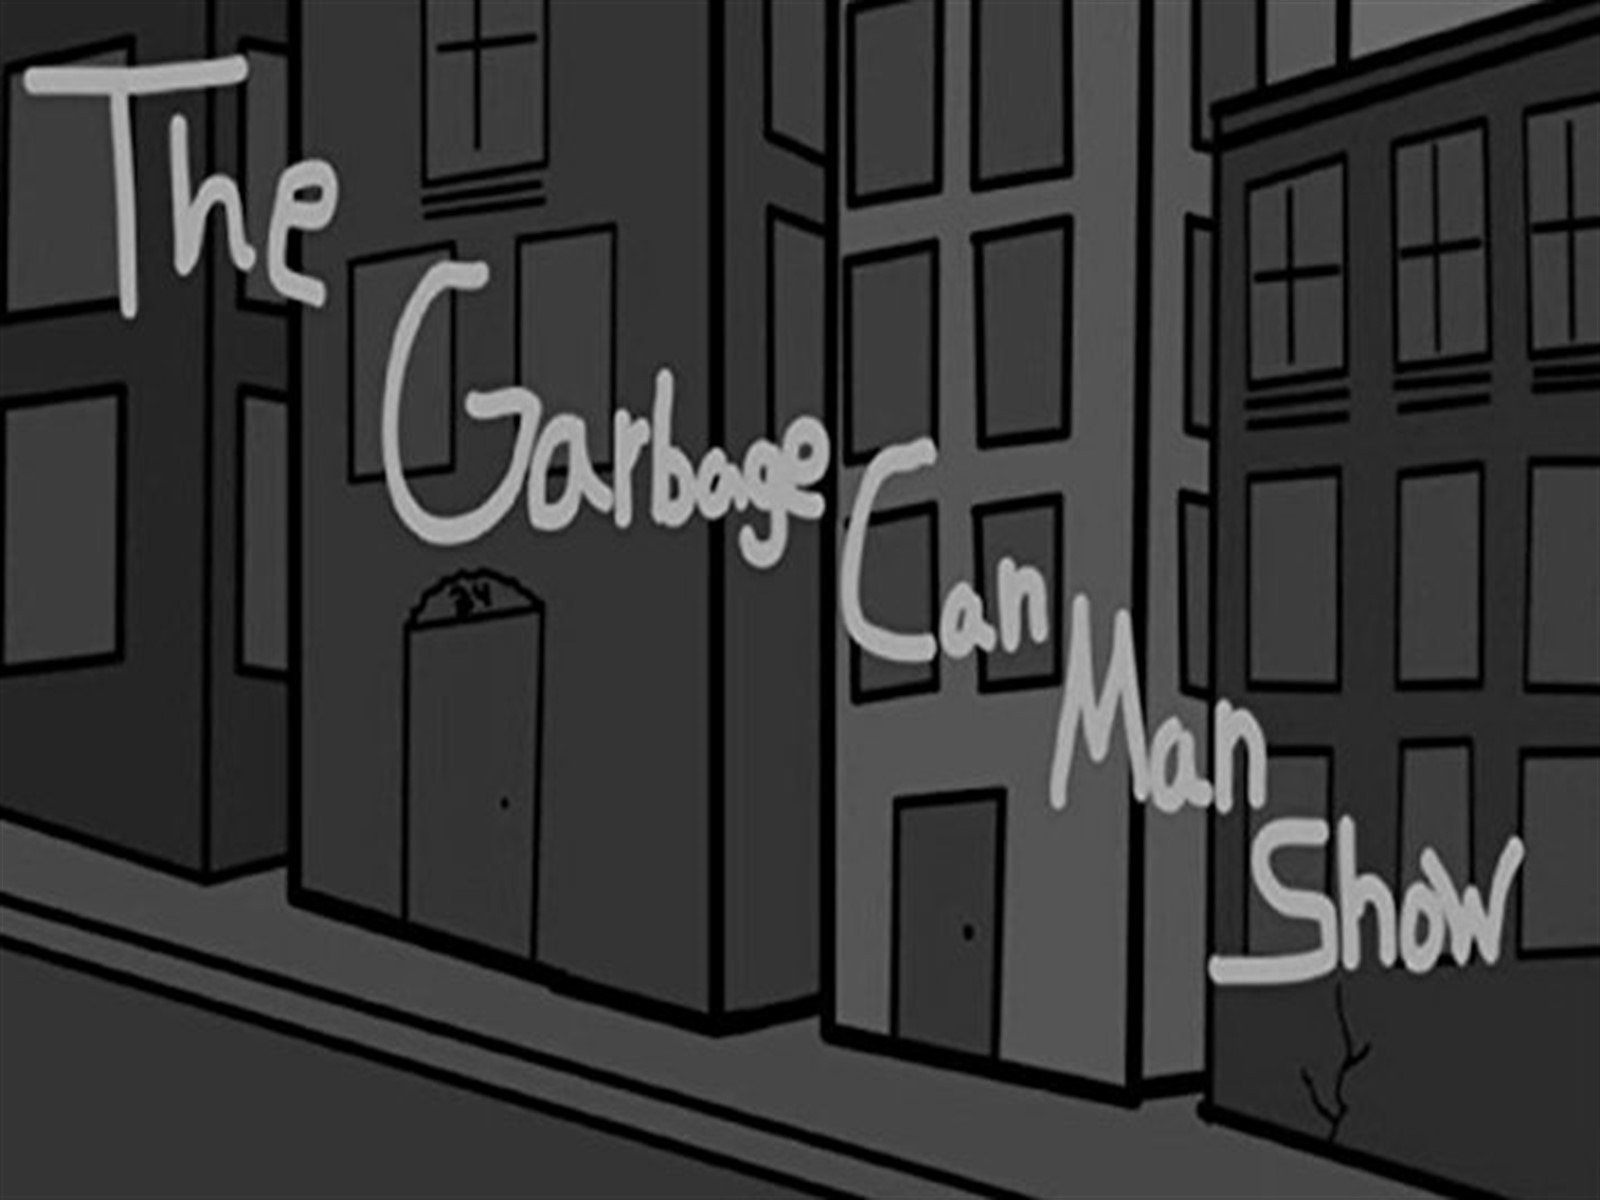 The Garbage Can Man Show - Season 3